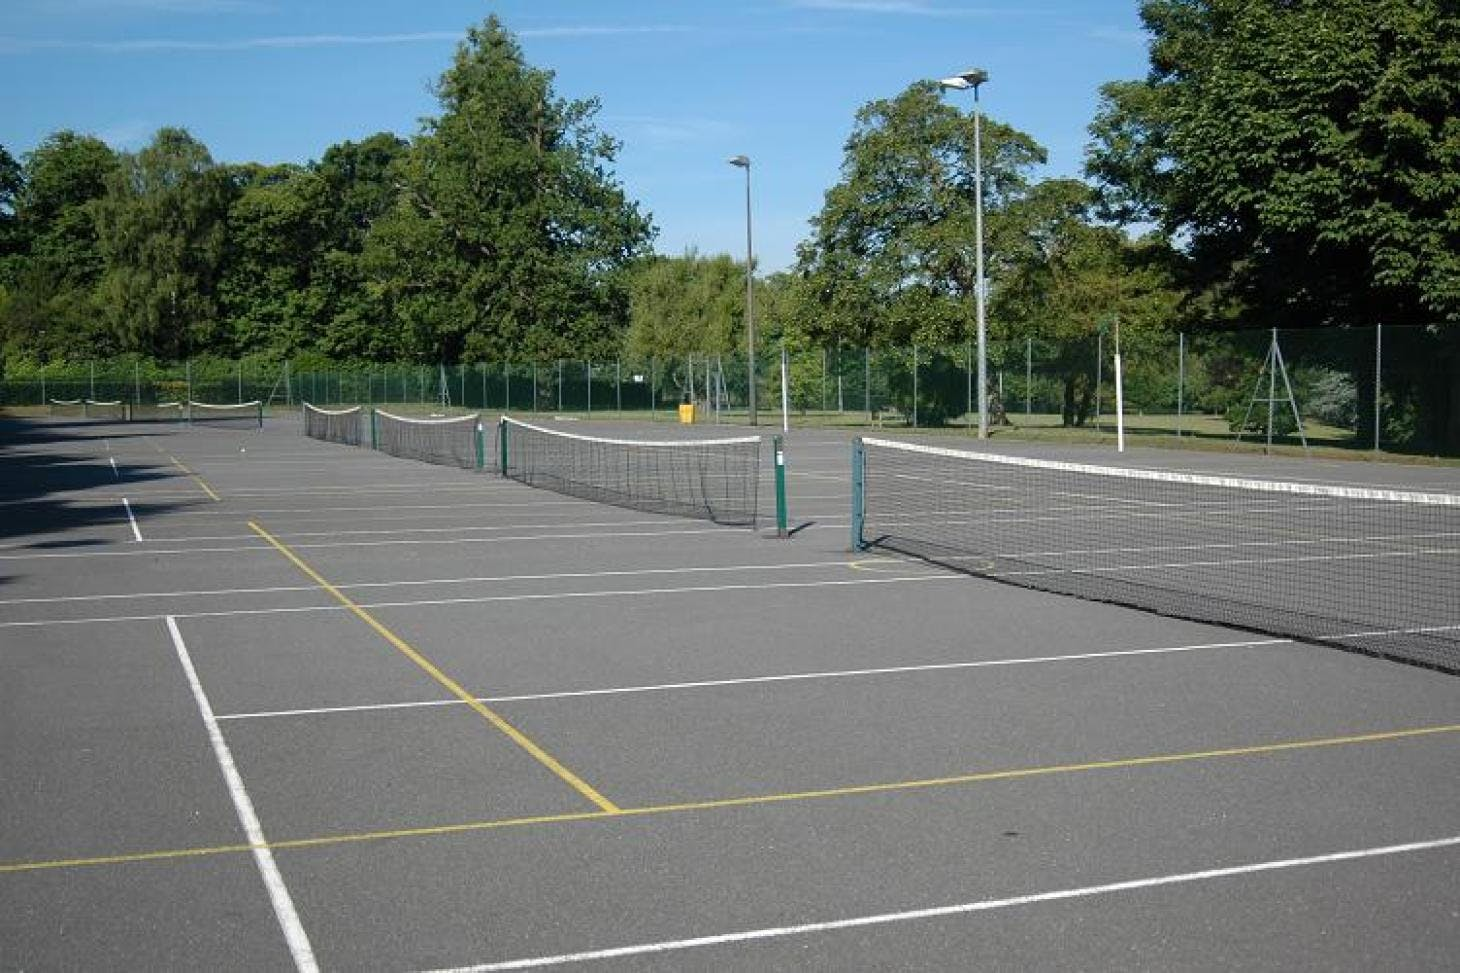 Croydon Sports Club Outdoor | Hard (macadam) tennis court